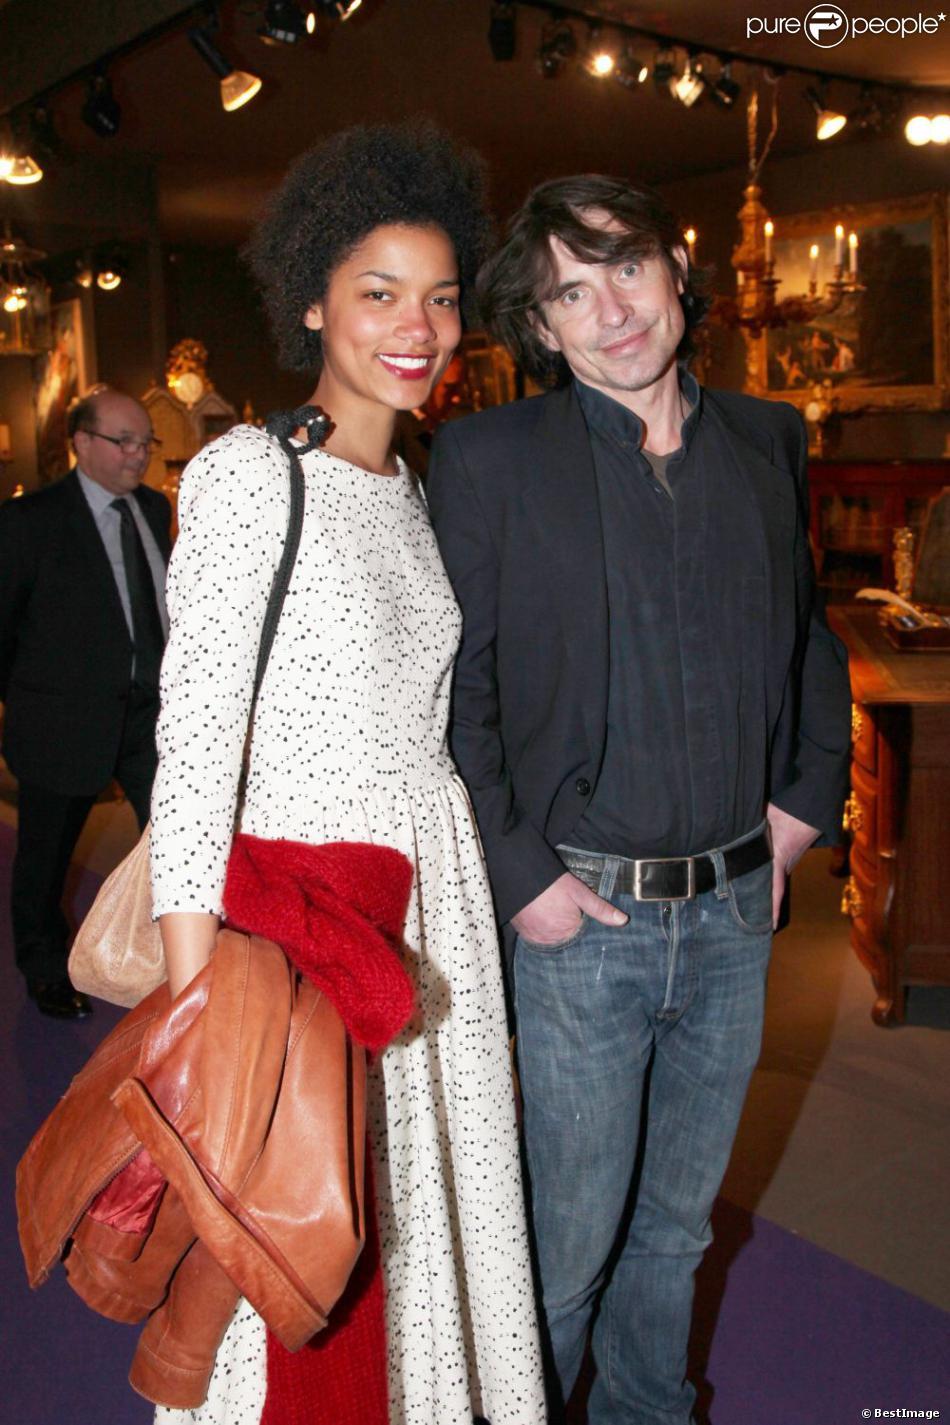 Arno Klarsfeld et sa fiancée à la soirée Massimo Gargia au ...